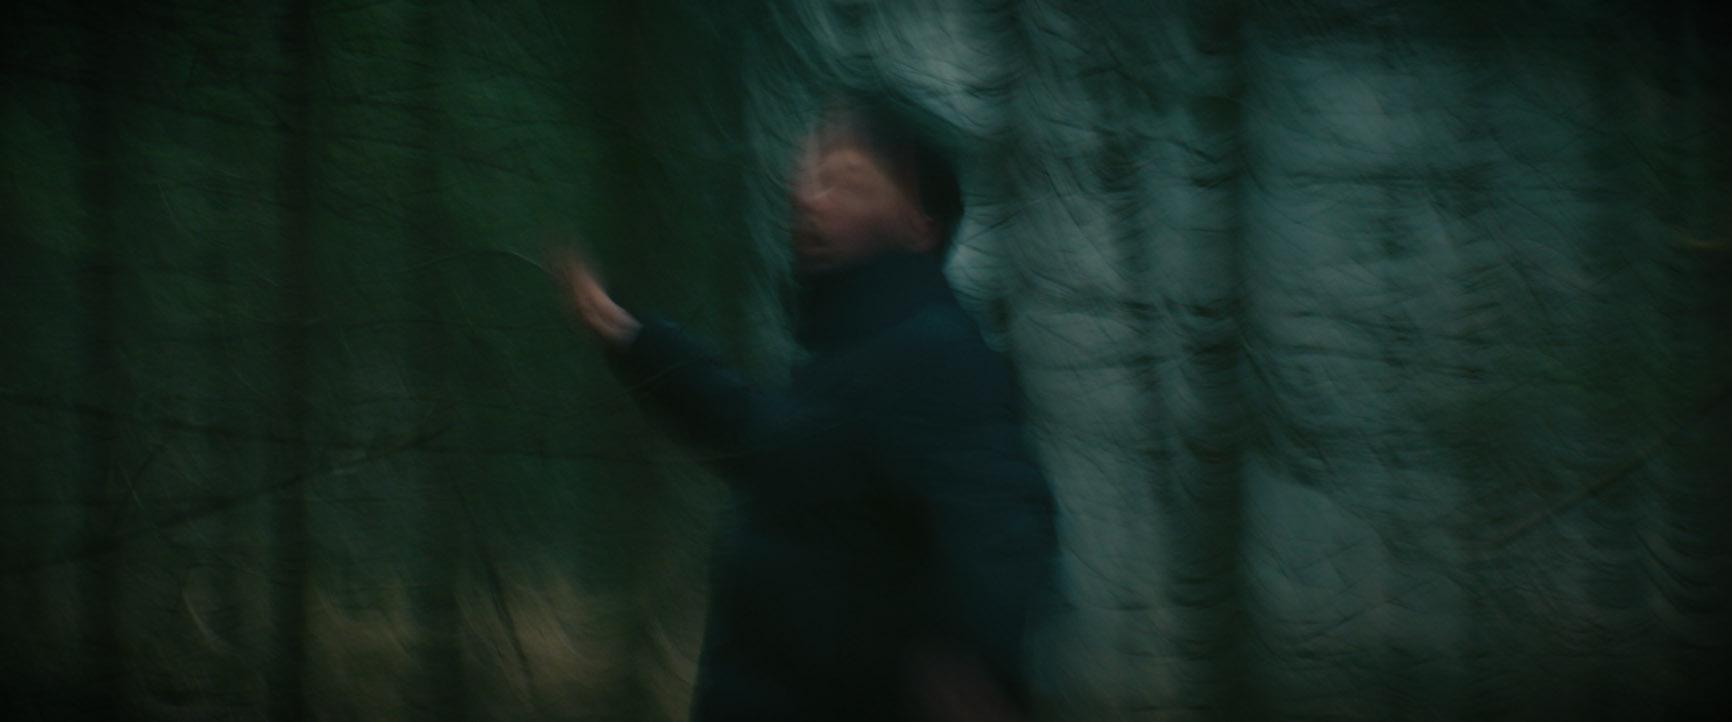 Musikvideo zum Lied Rosengarten